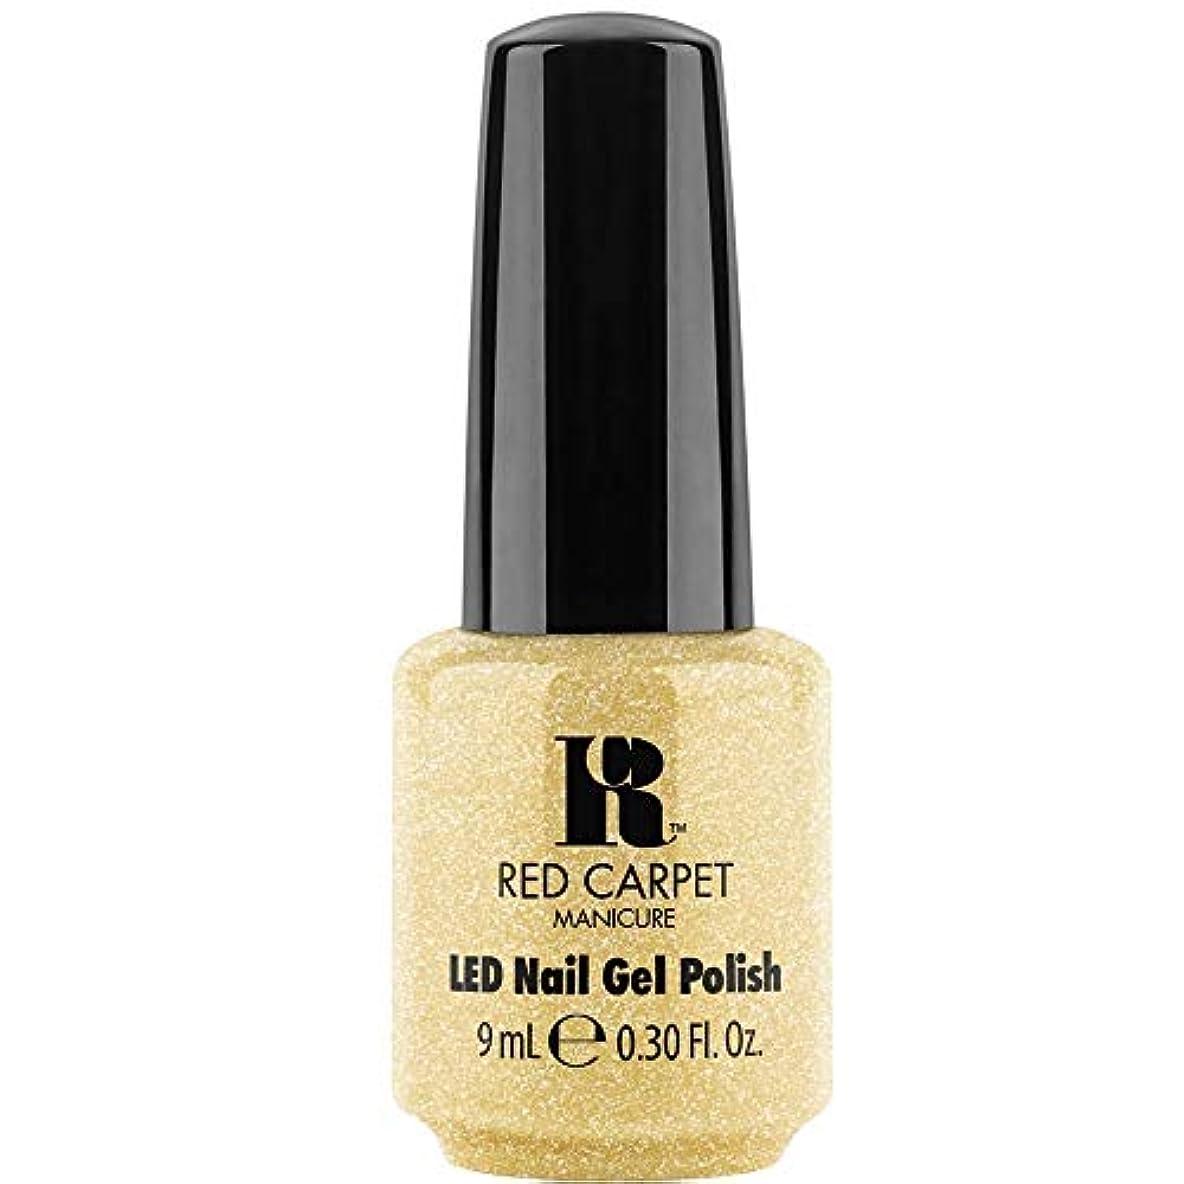 苦情文句加速度束Red Carpet Manicure - LED Nail Gel Polish - Mirror Check - 0.3oz / 9ml